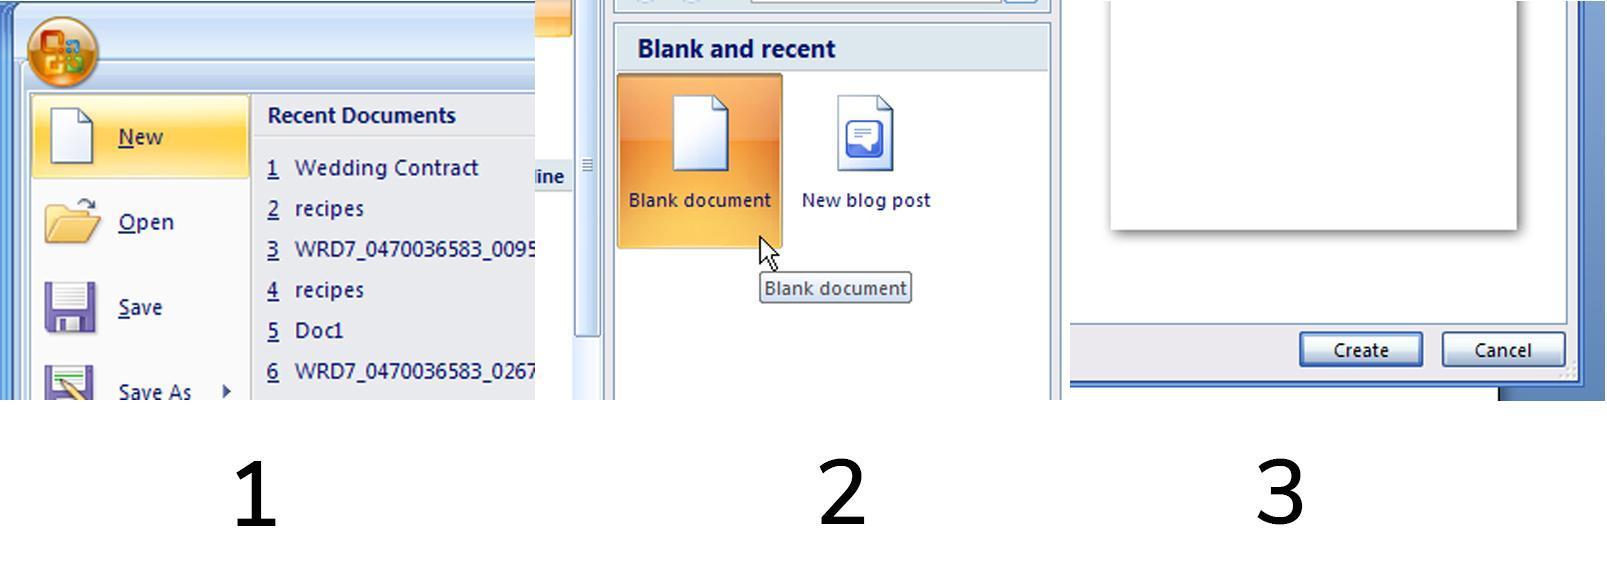 jelaskan 3 cara untuk membuka dokumen baru pada microsoft word